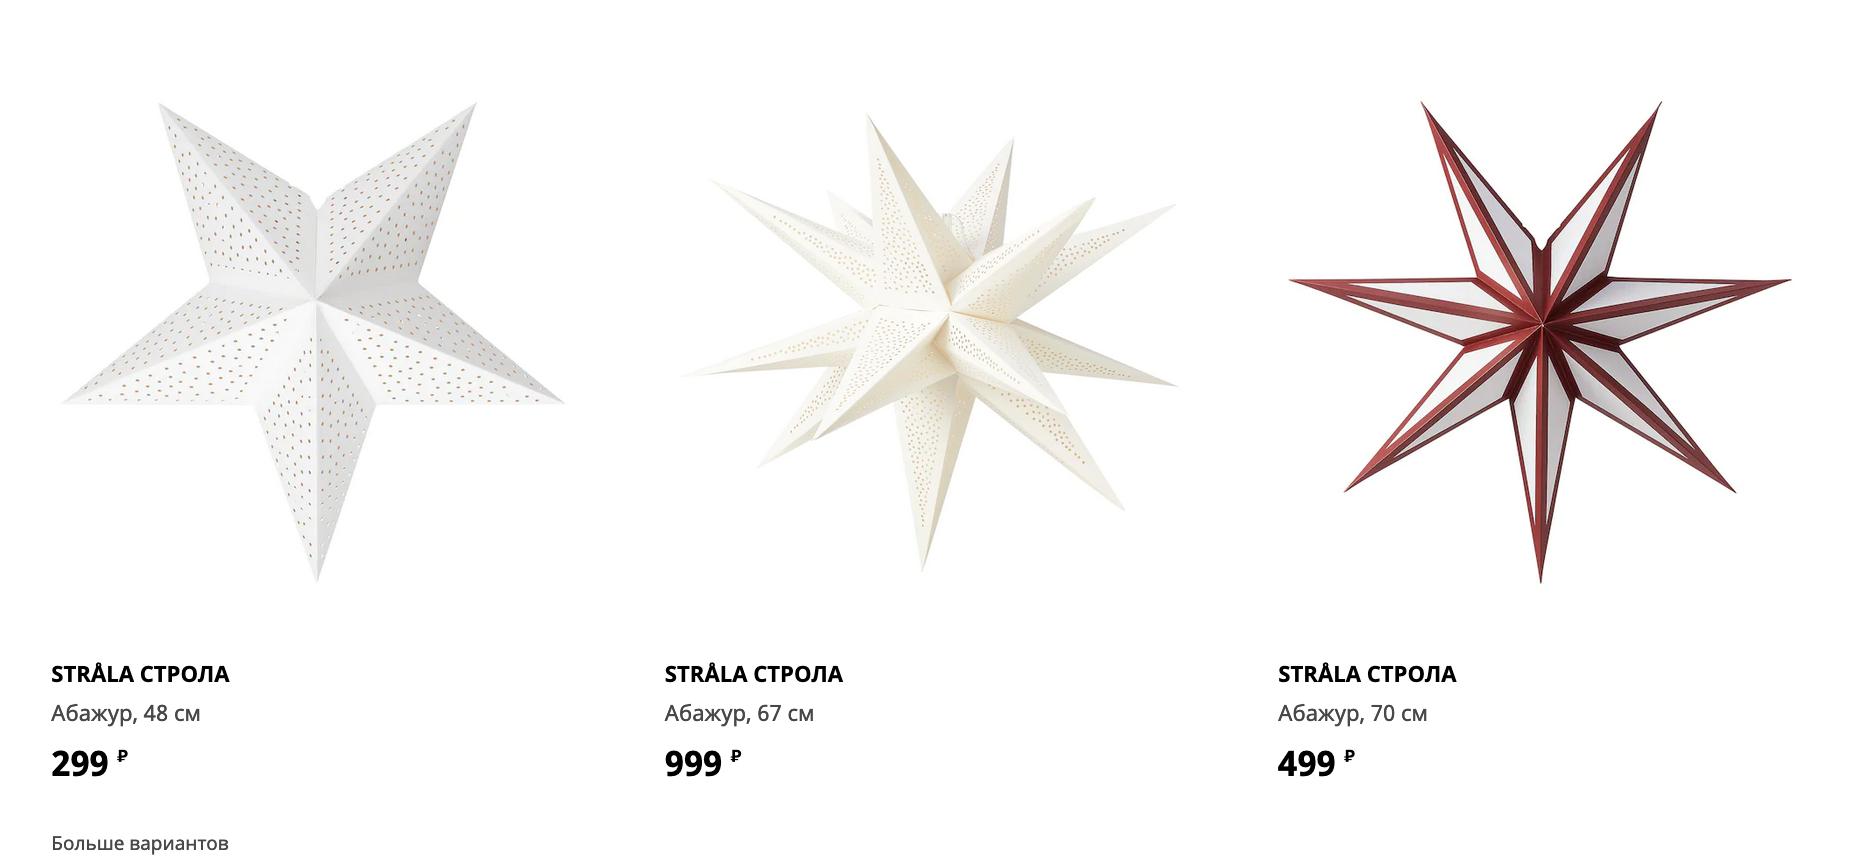 Скриншот с сайта IKEA.ru, звезды абажуры СТРОЛА